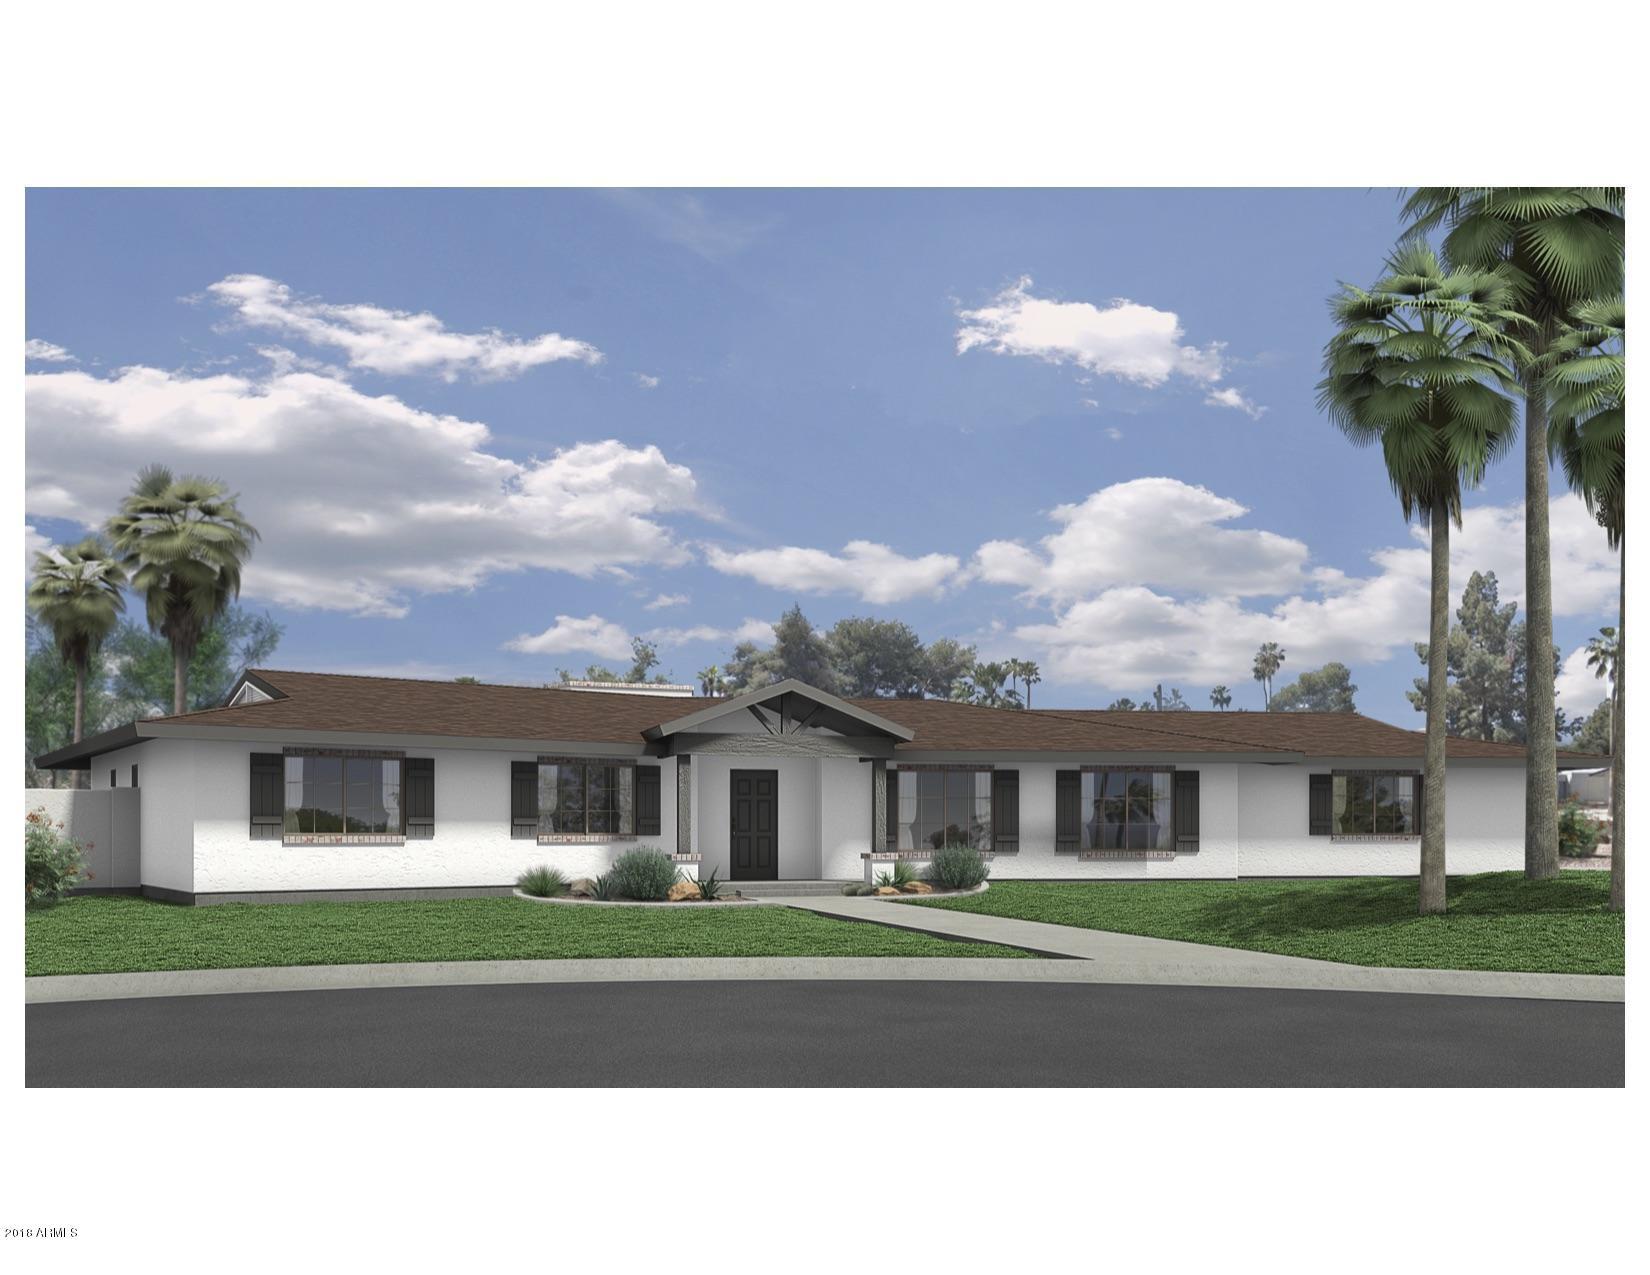 MLS 5838628 951 E TORNASOL Circle, Litchfield Park, AZ 85340 Litchfield Park AZ Golf